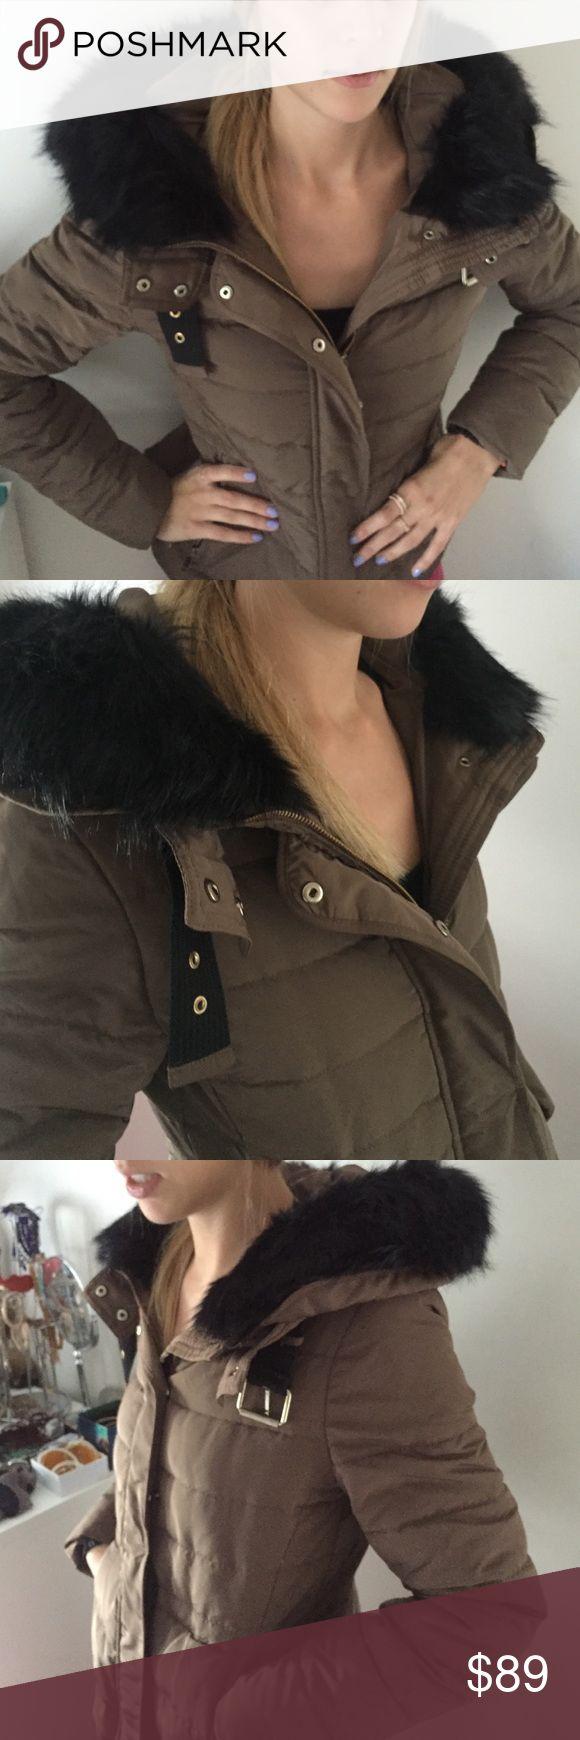 Zara Winter Coat with Fur Brown with black fur Zara coat Zara Jackets & Coats Puffers